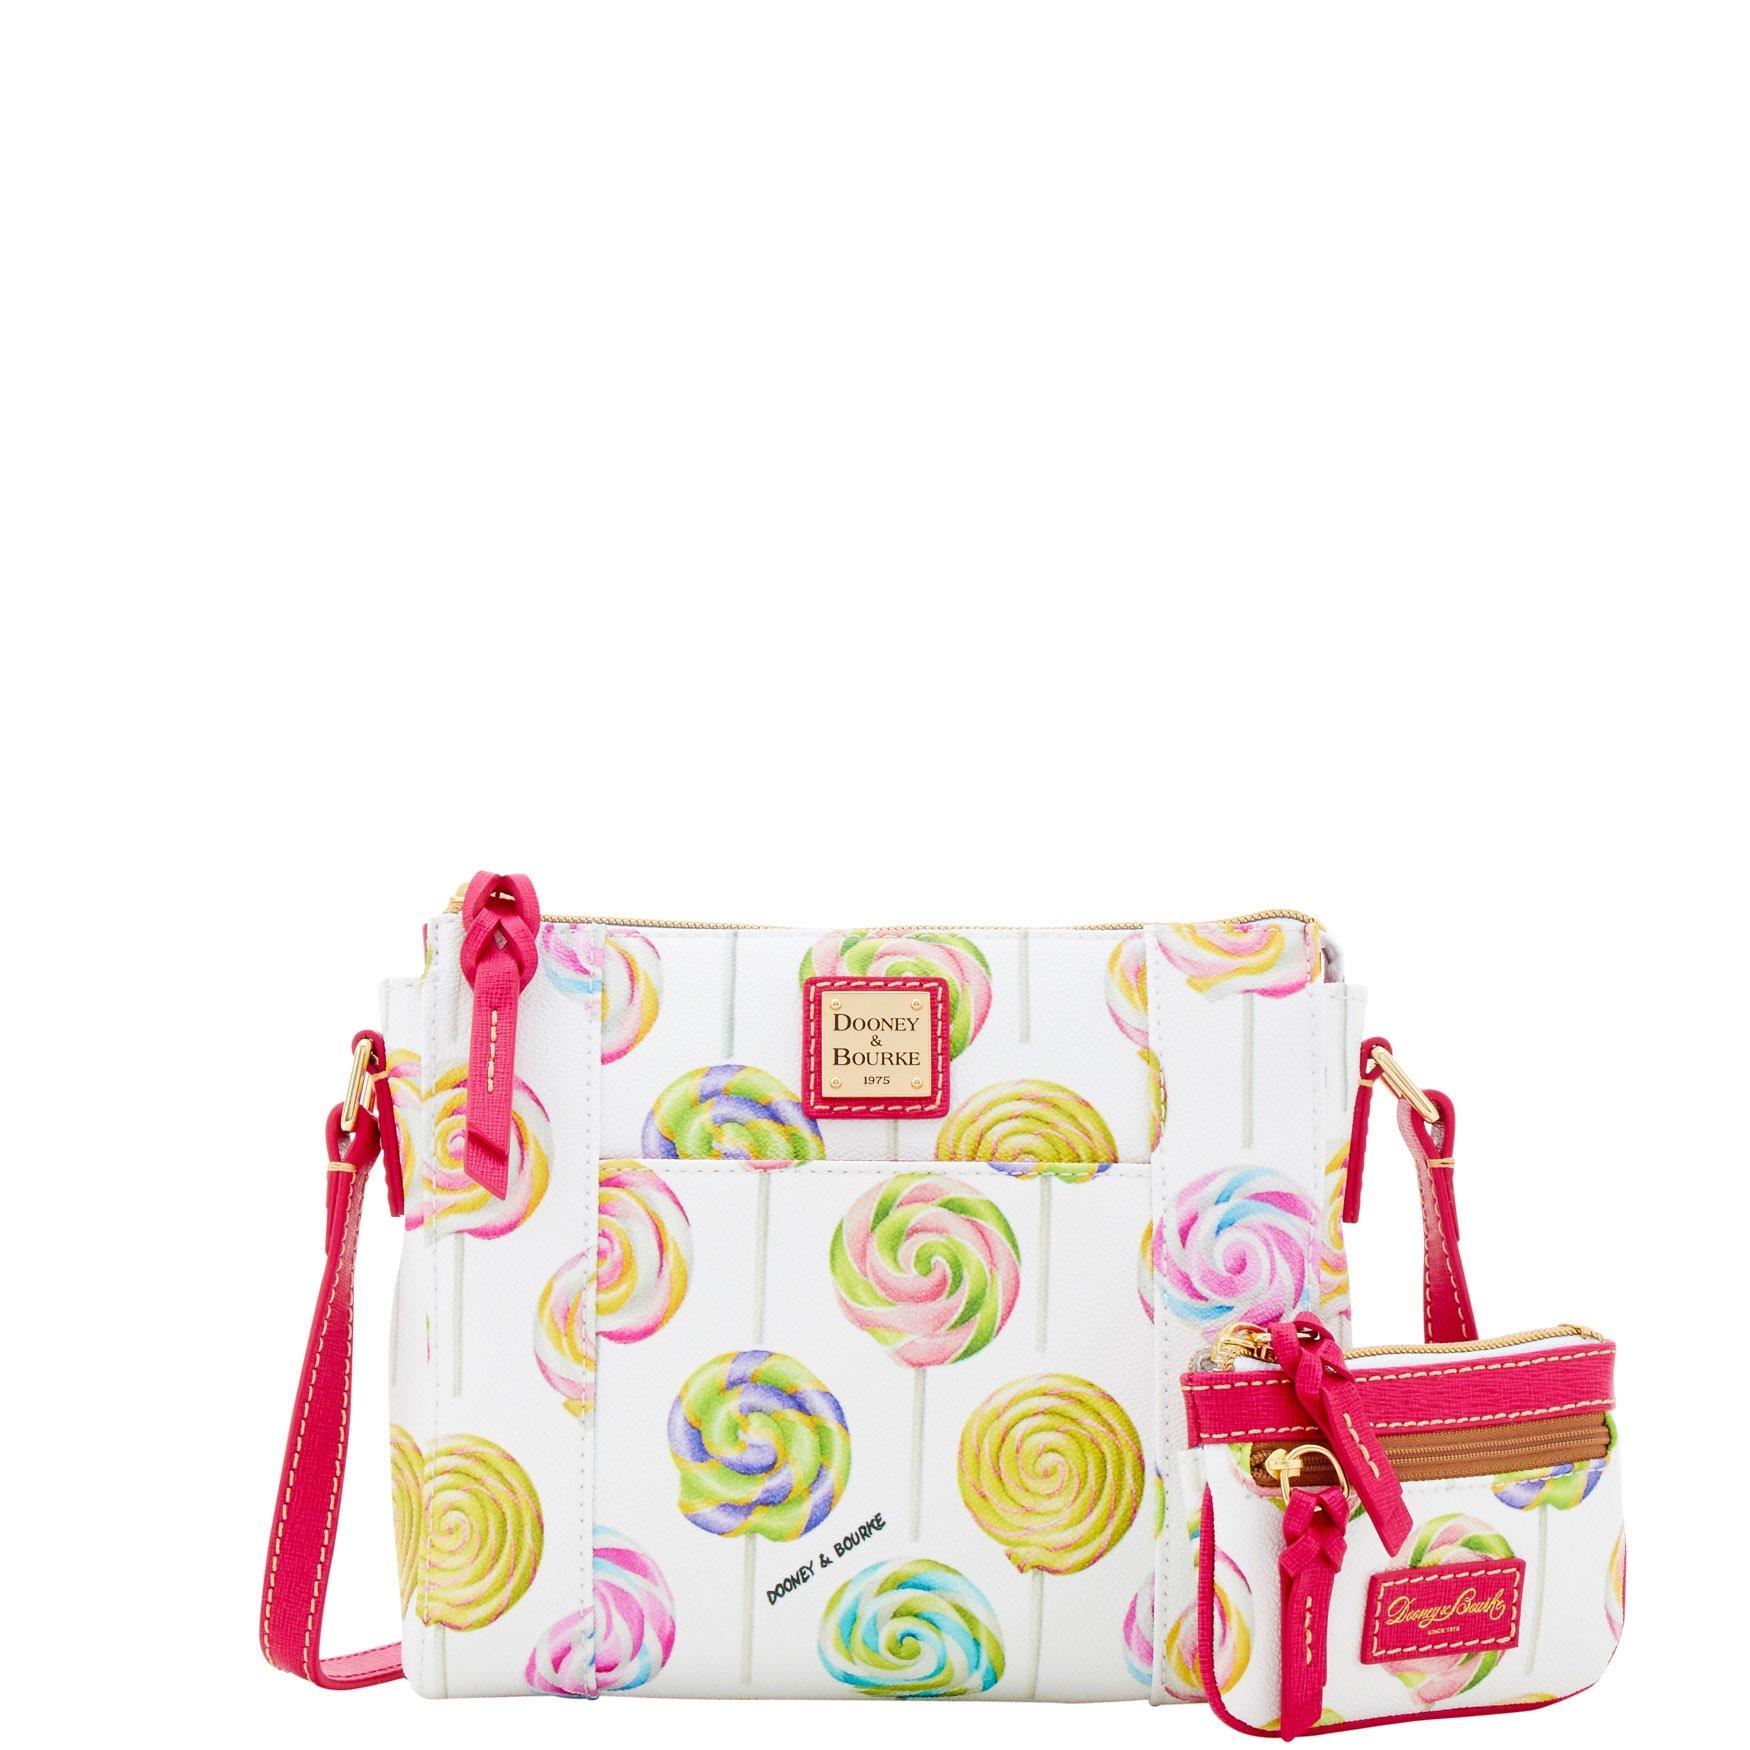 Dooney & Bourke Swirl Lollipop Lexington Crossbody Small Coin Case Shoulder Bag